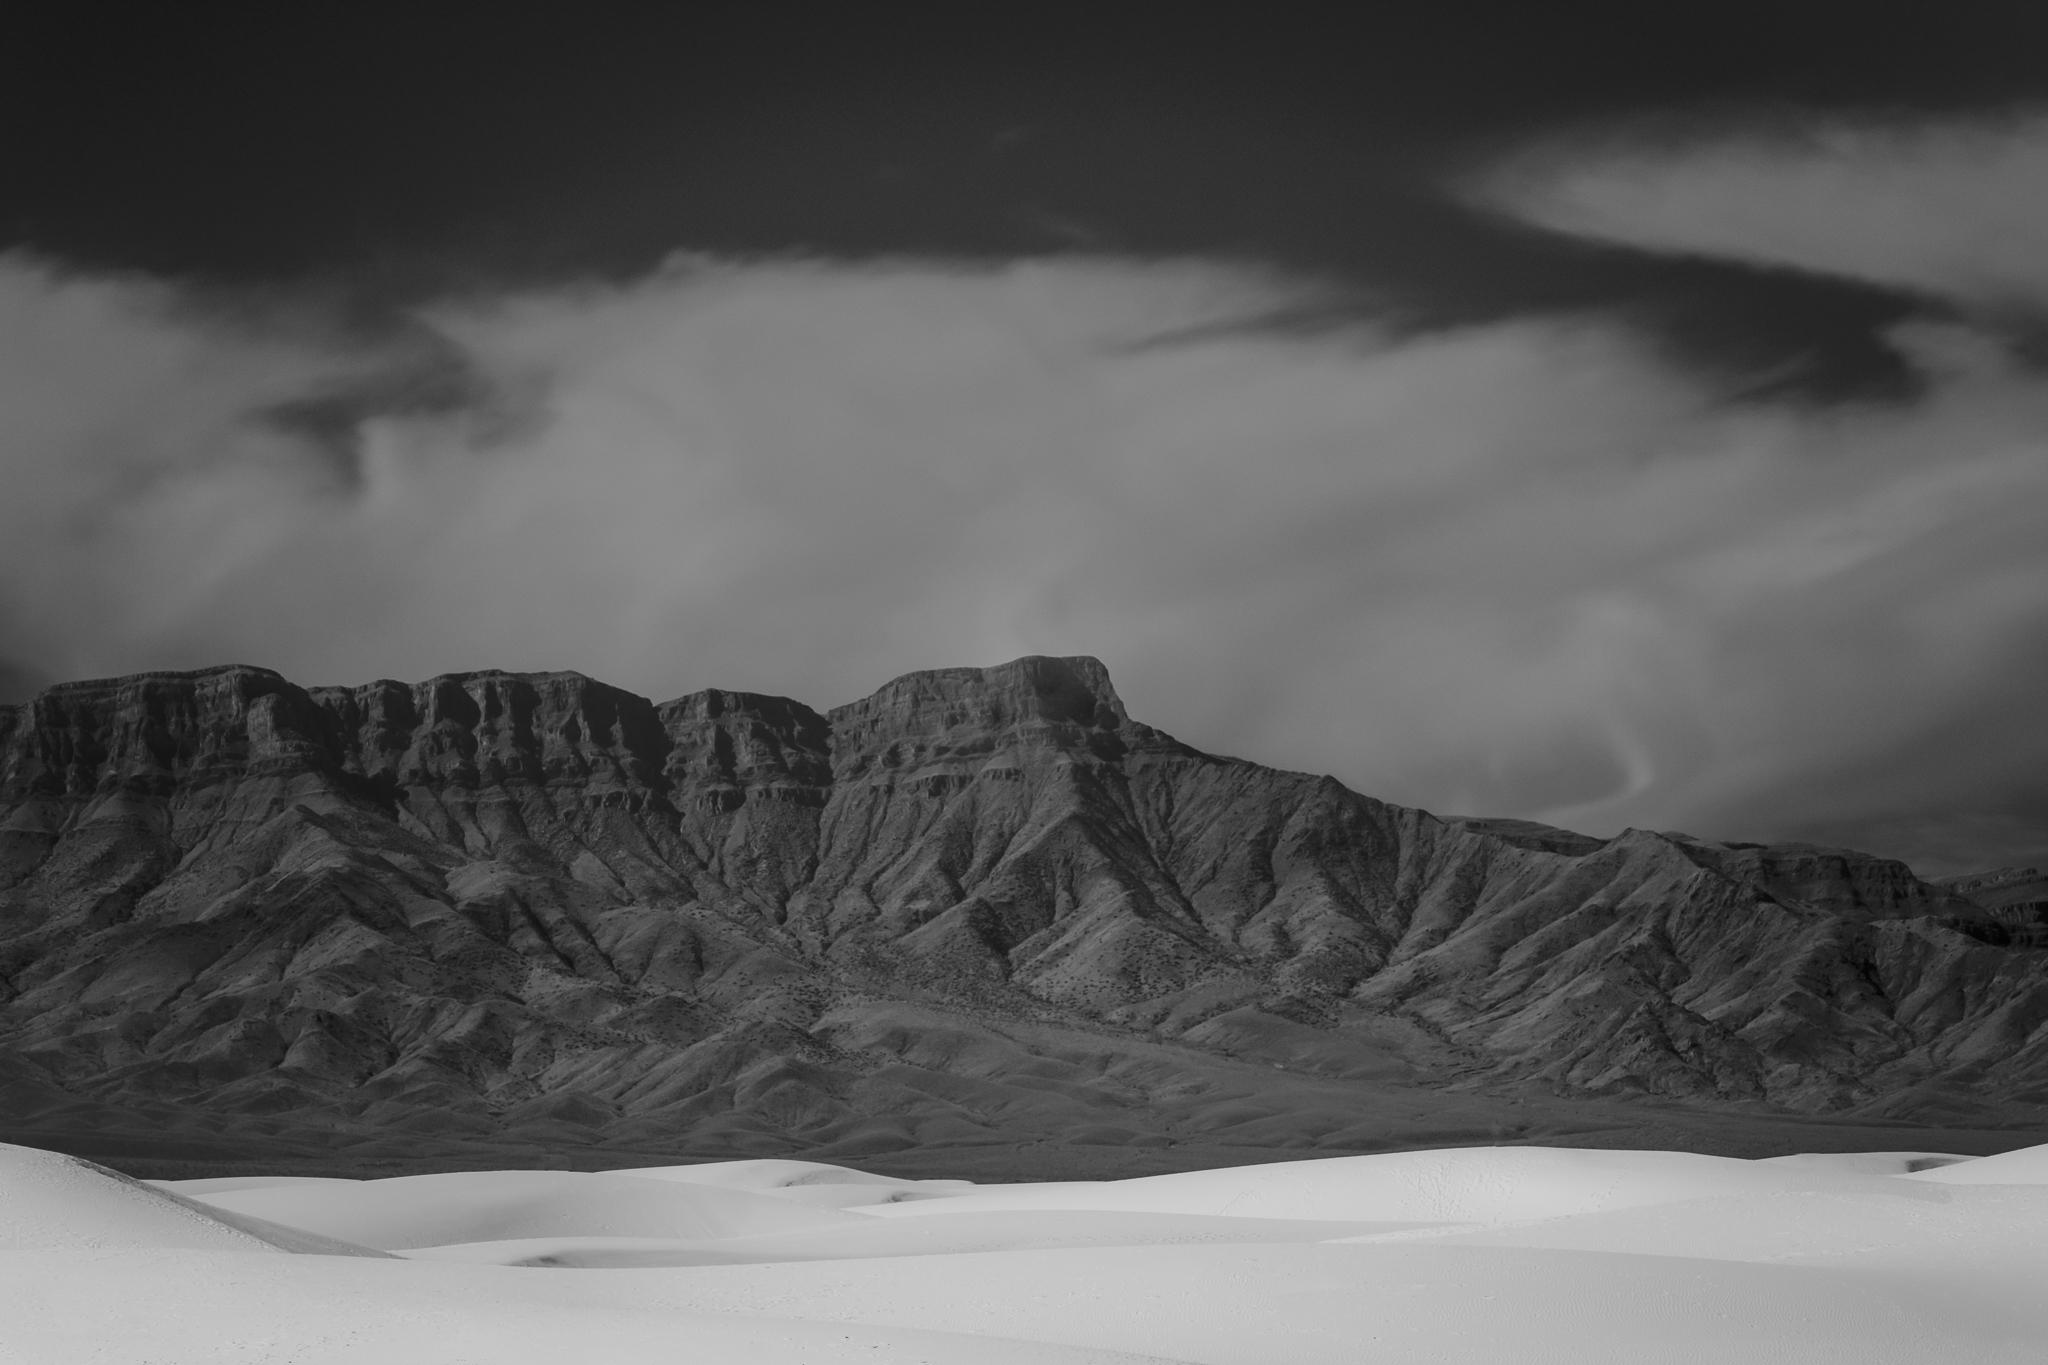 White Sands National Monument 01